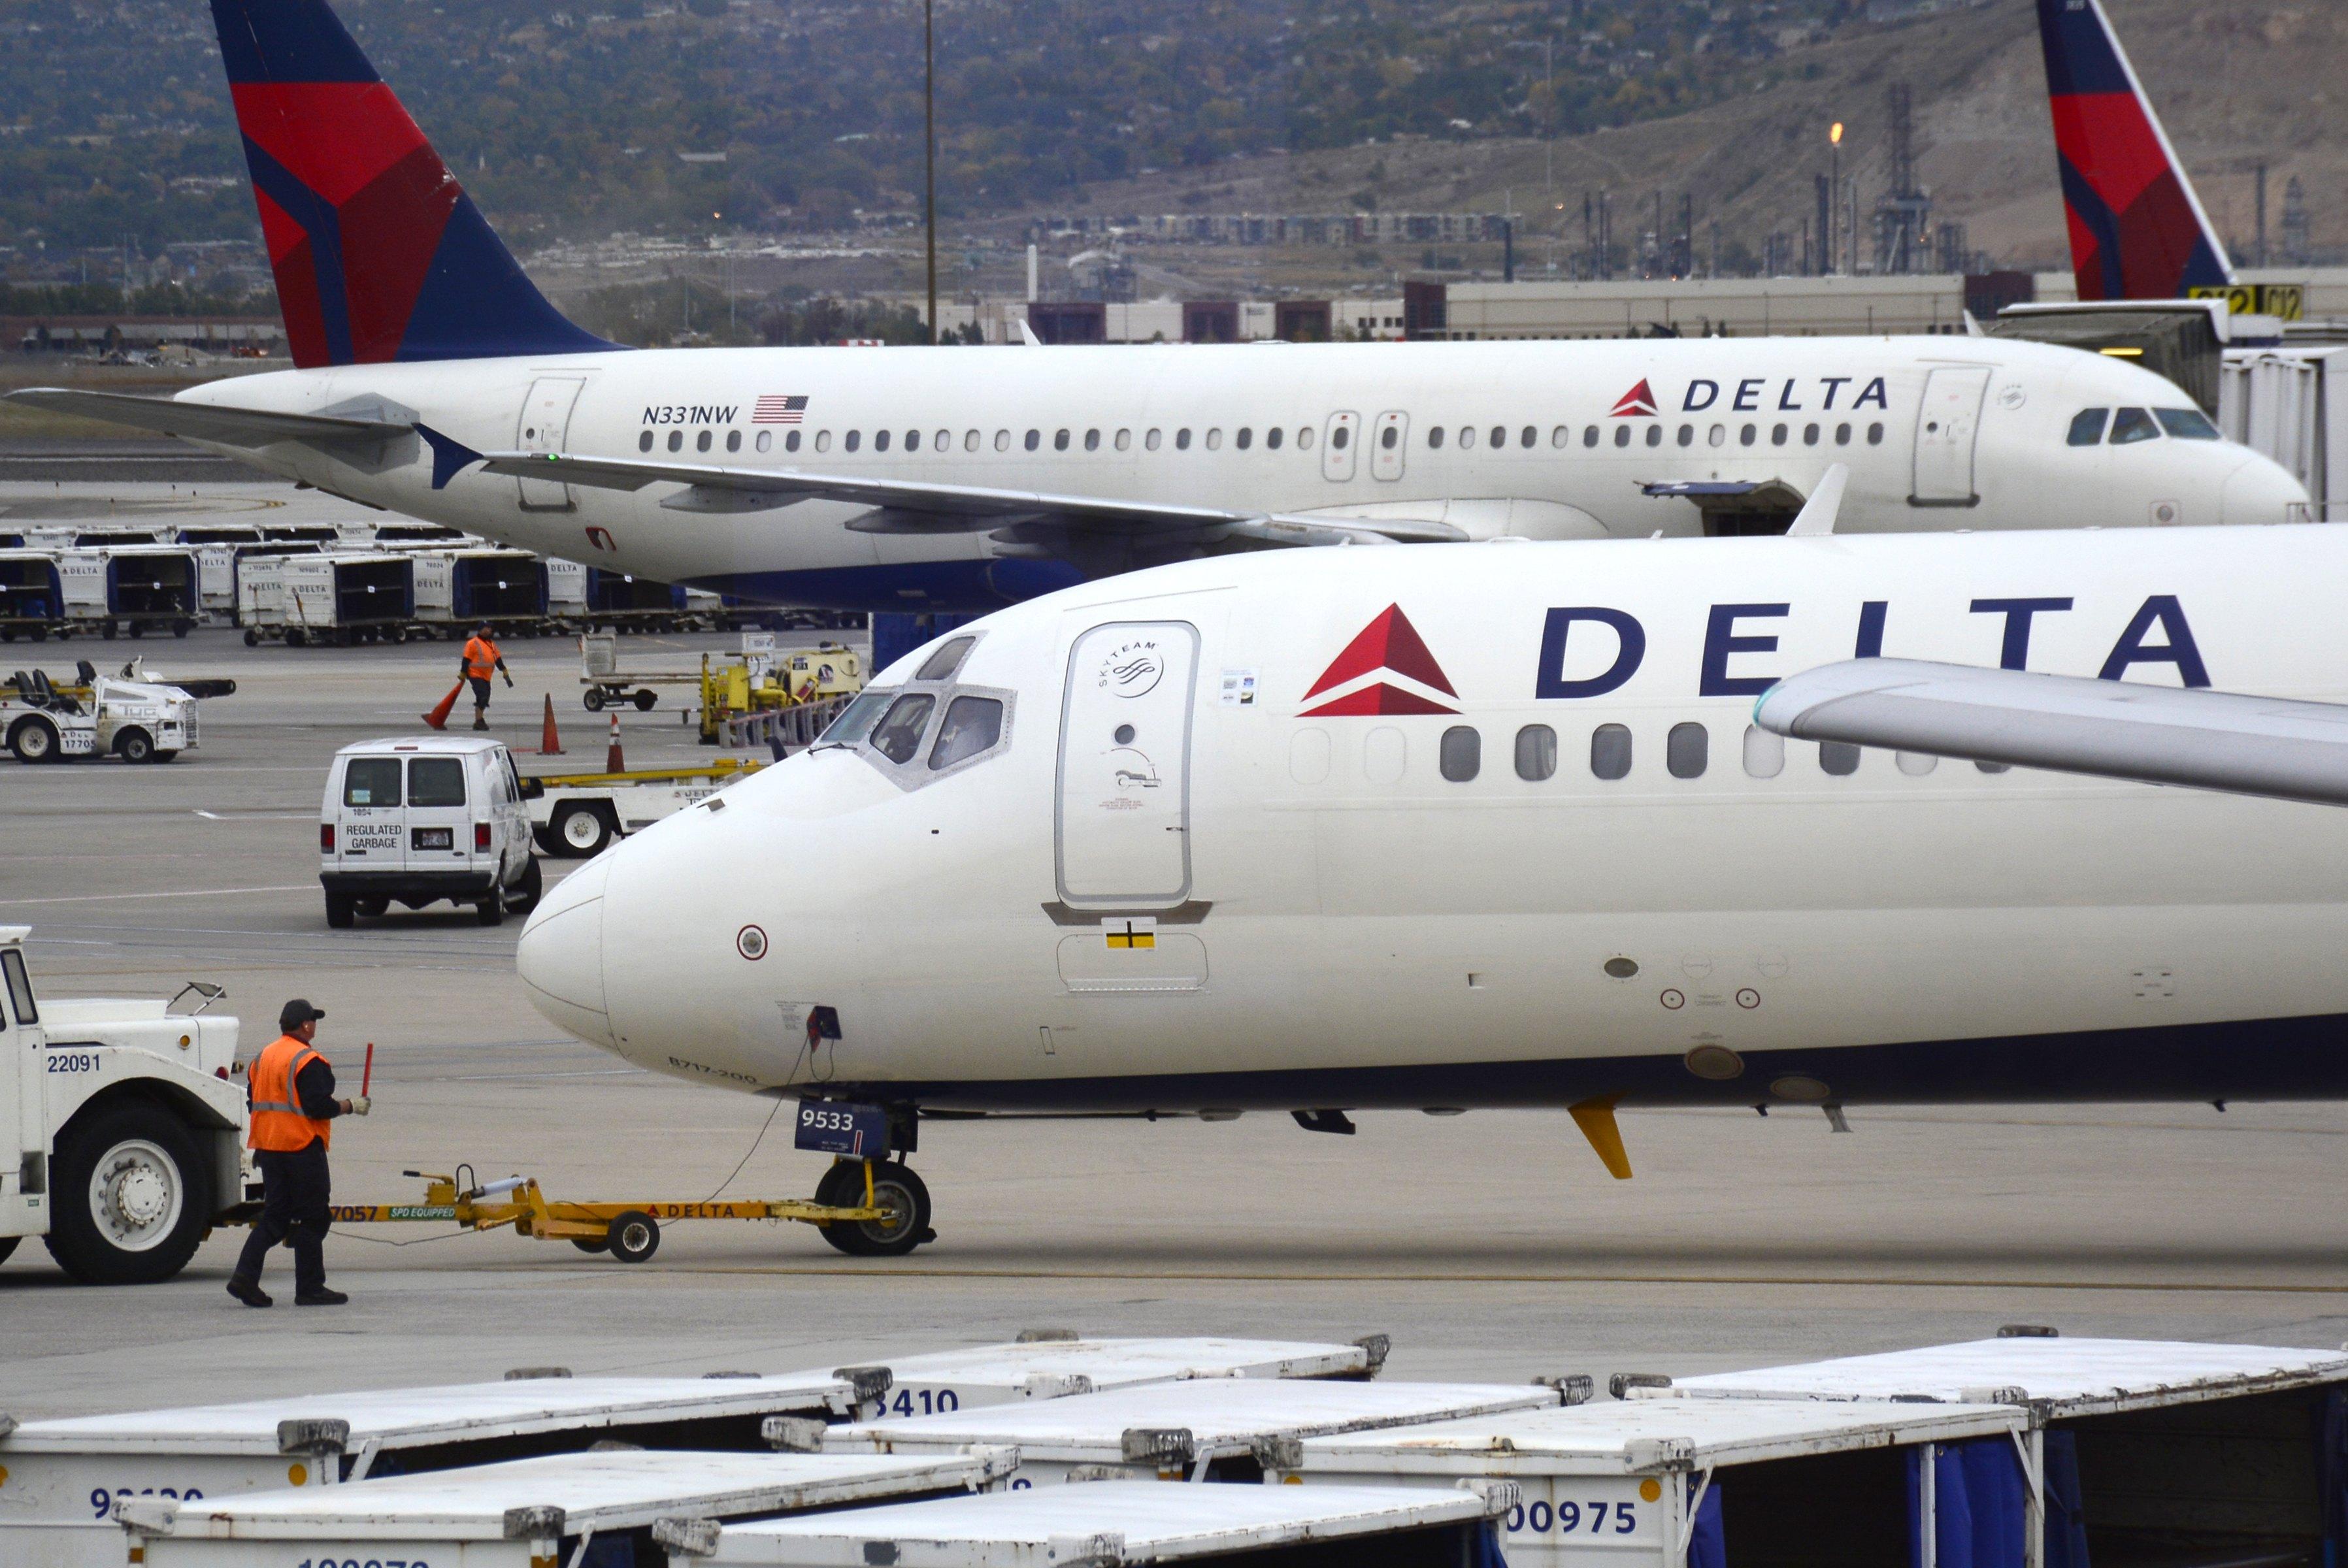 Delta Airlines passenger planes at Salt Lake City International Airport in Salt Lake City, Utah.